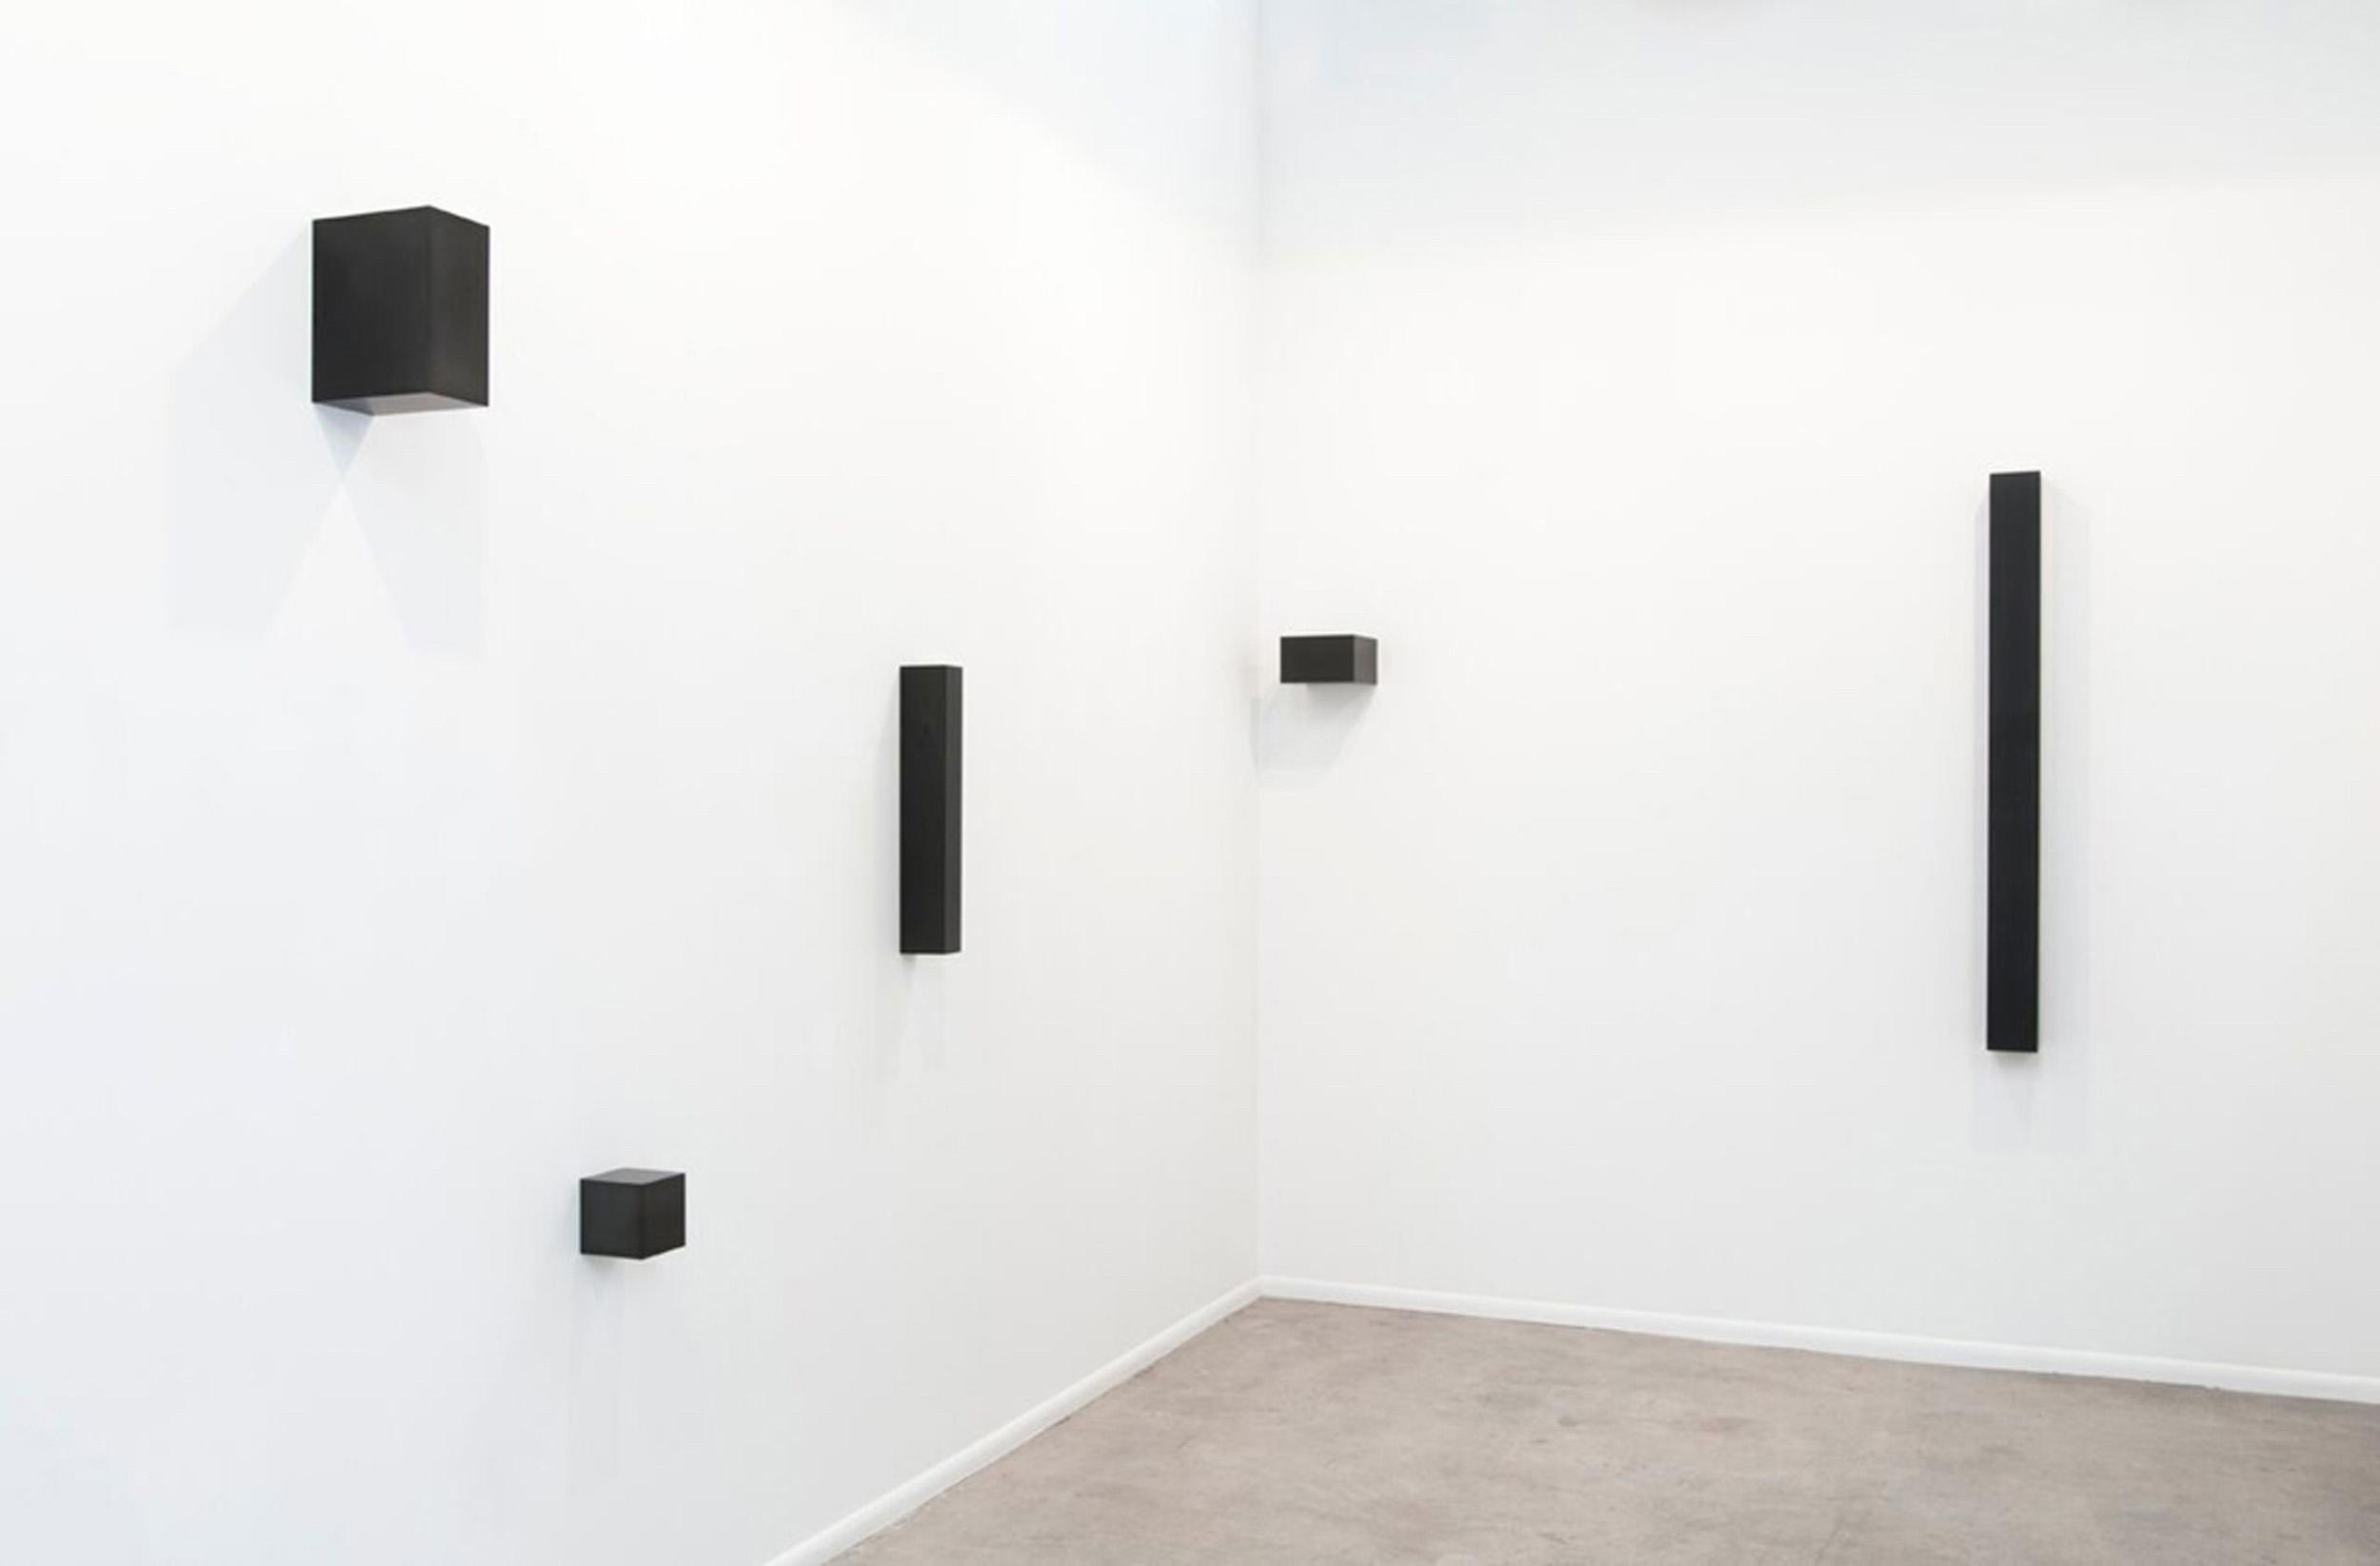 "Graphite Sculptures (l to r), Askew Cube, 2011, 7.5"" x 7.6"" x 7.6""; Cube, 2015, 5.1"" x 5.1"" x 5.1""; Vertical Bar, 2009, 24.25"" x 3.25"" x 4.25"";  Golden Mean Horizontal, 2015, 5.4"" x 8.9"" x 8.9""; Untitled (Column), 2015, 3"" x 3"" x 70"""